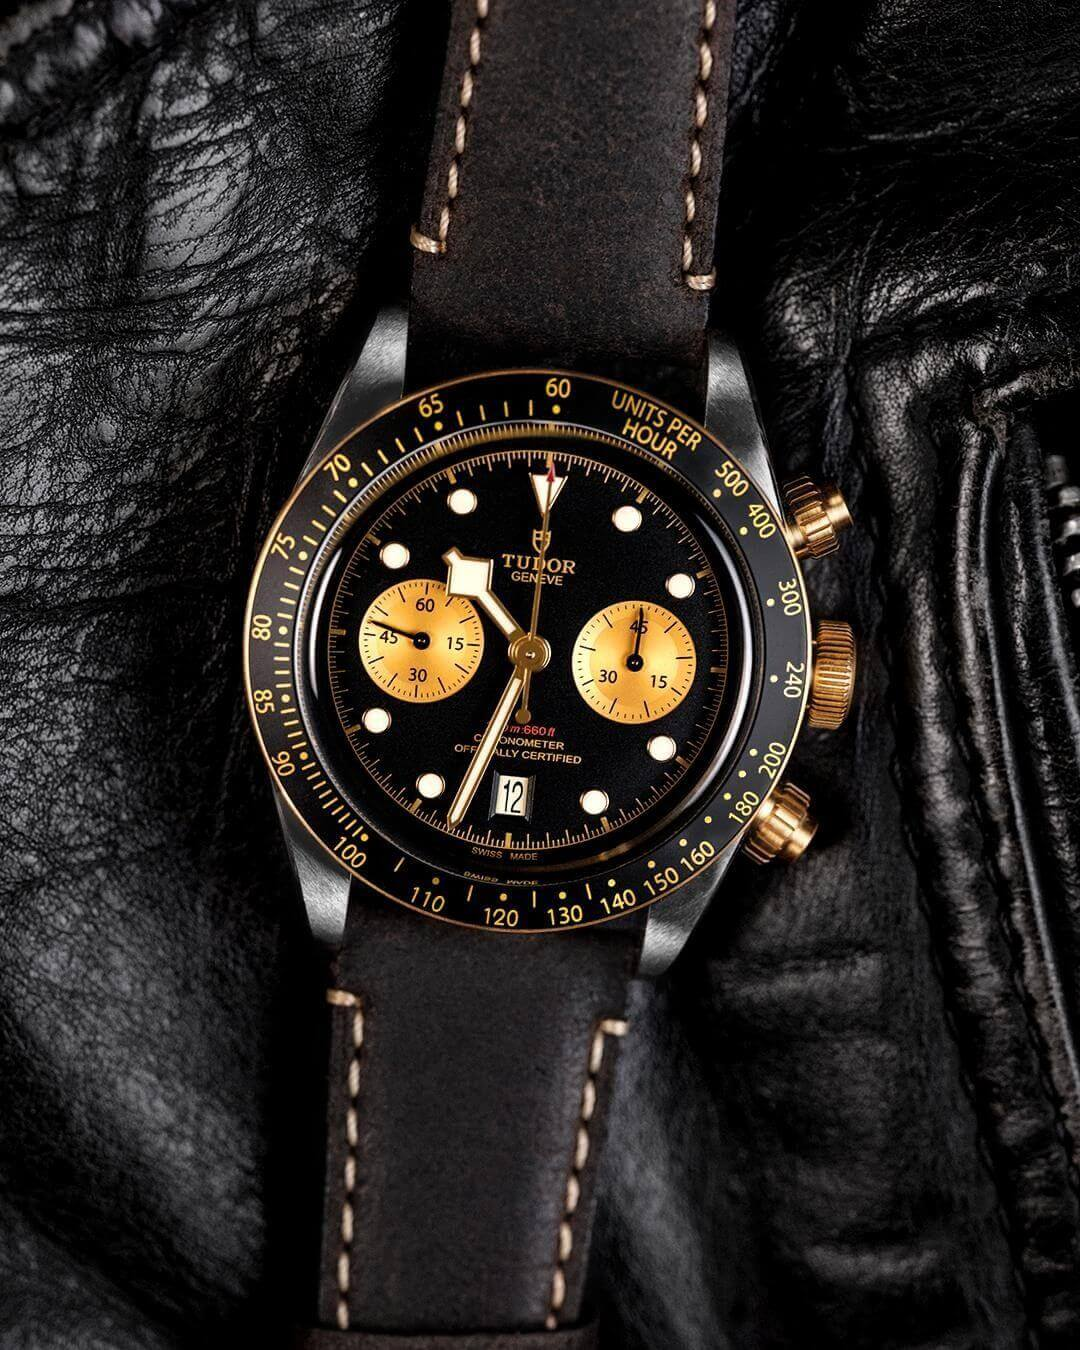 TUDOR Black Bay Chrono S&G Ref. 79363N-0002 - Mamic 1970